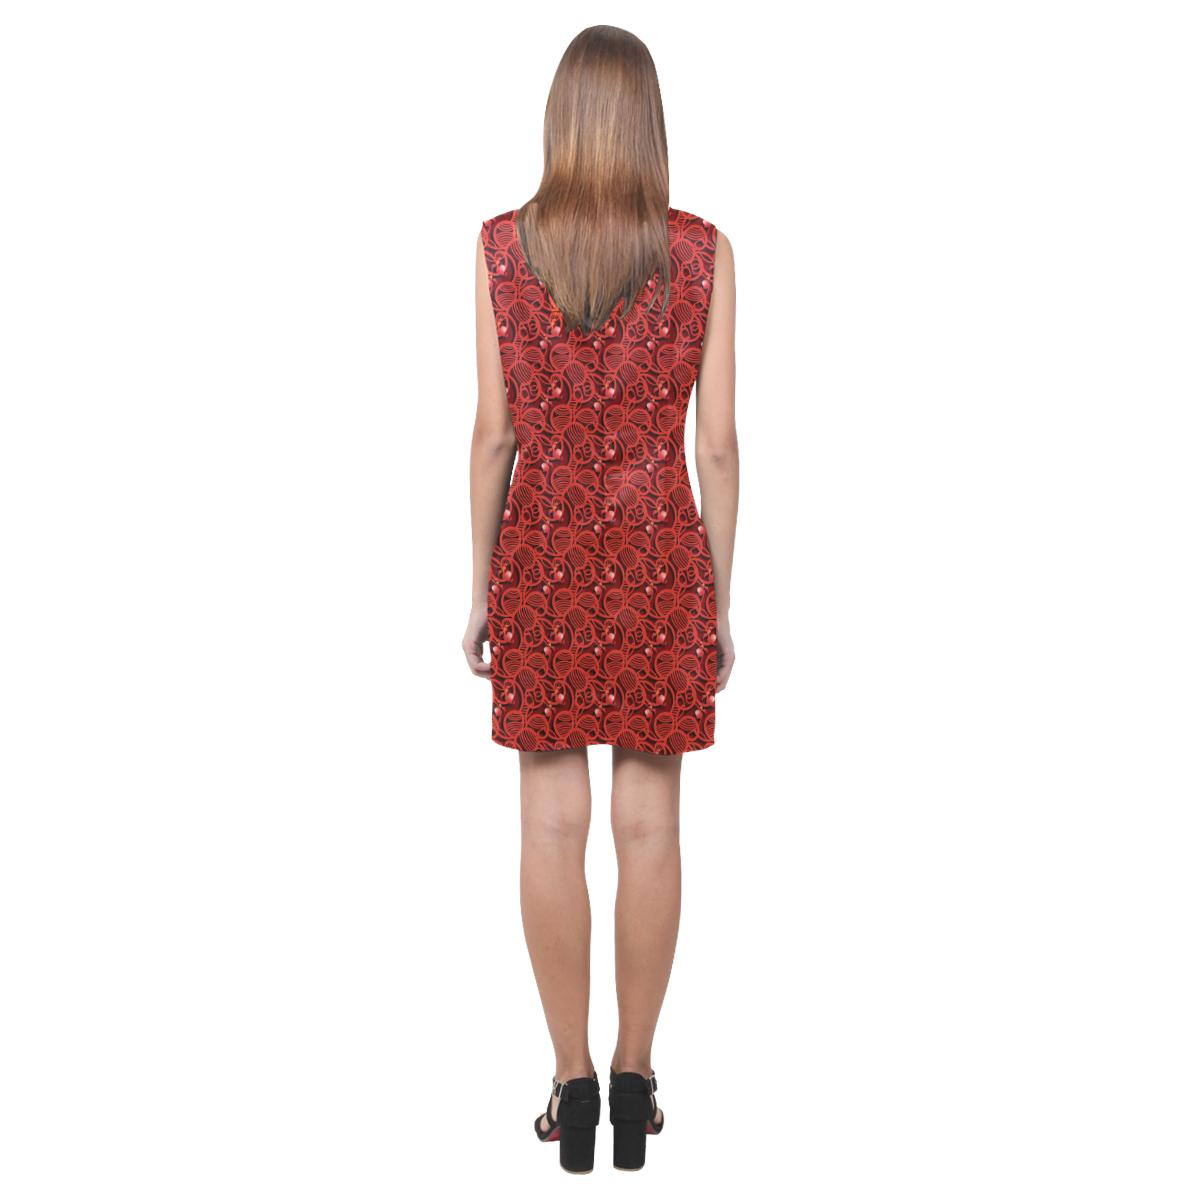 Cherry Tomato Red Hearts Phoebe Sleeveless V-Neck Dress (Model D09)